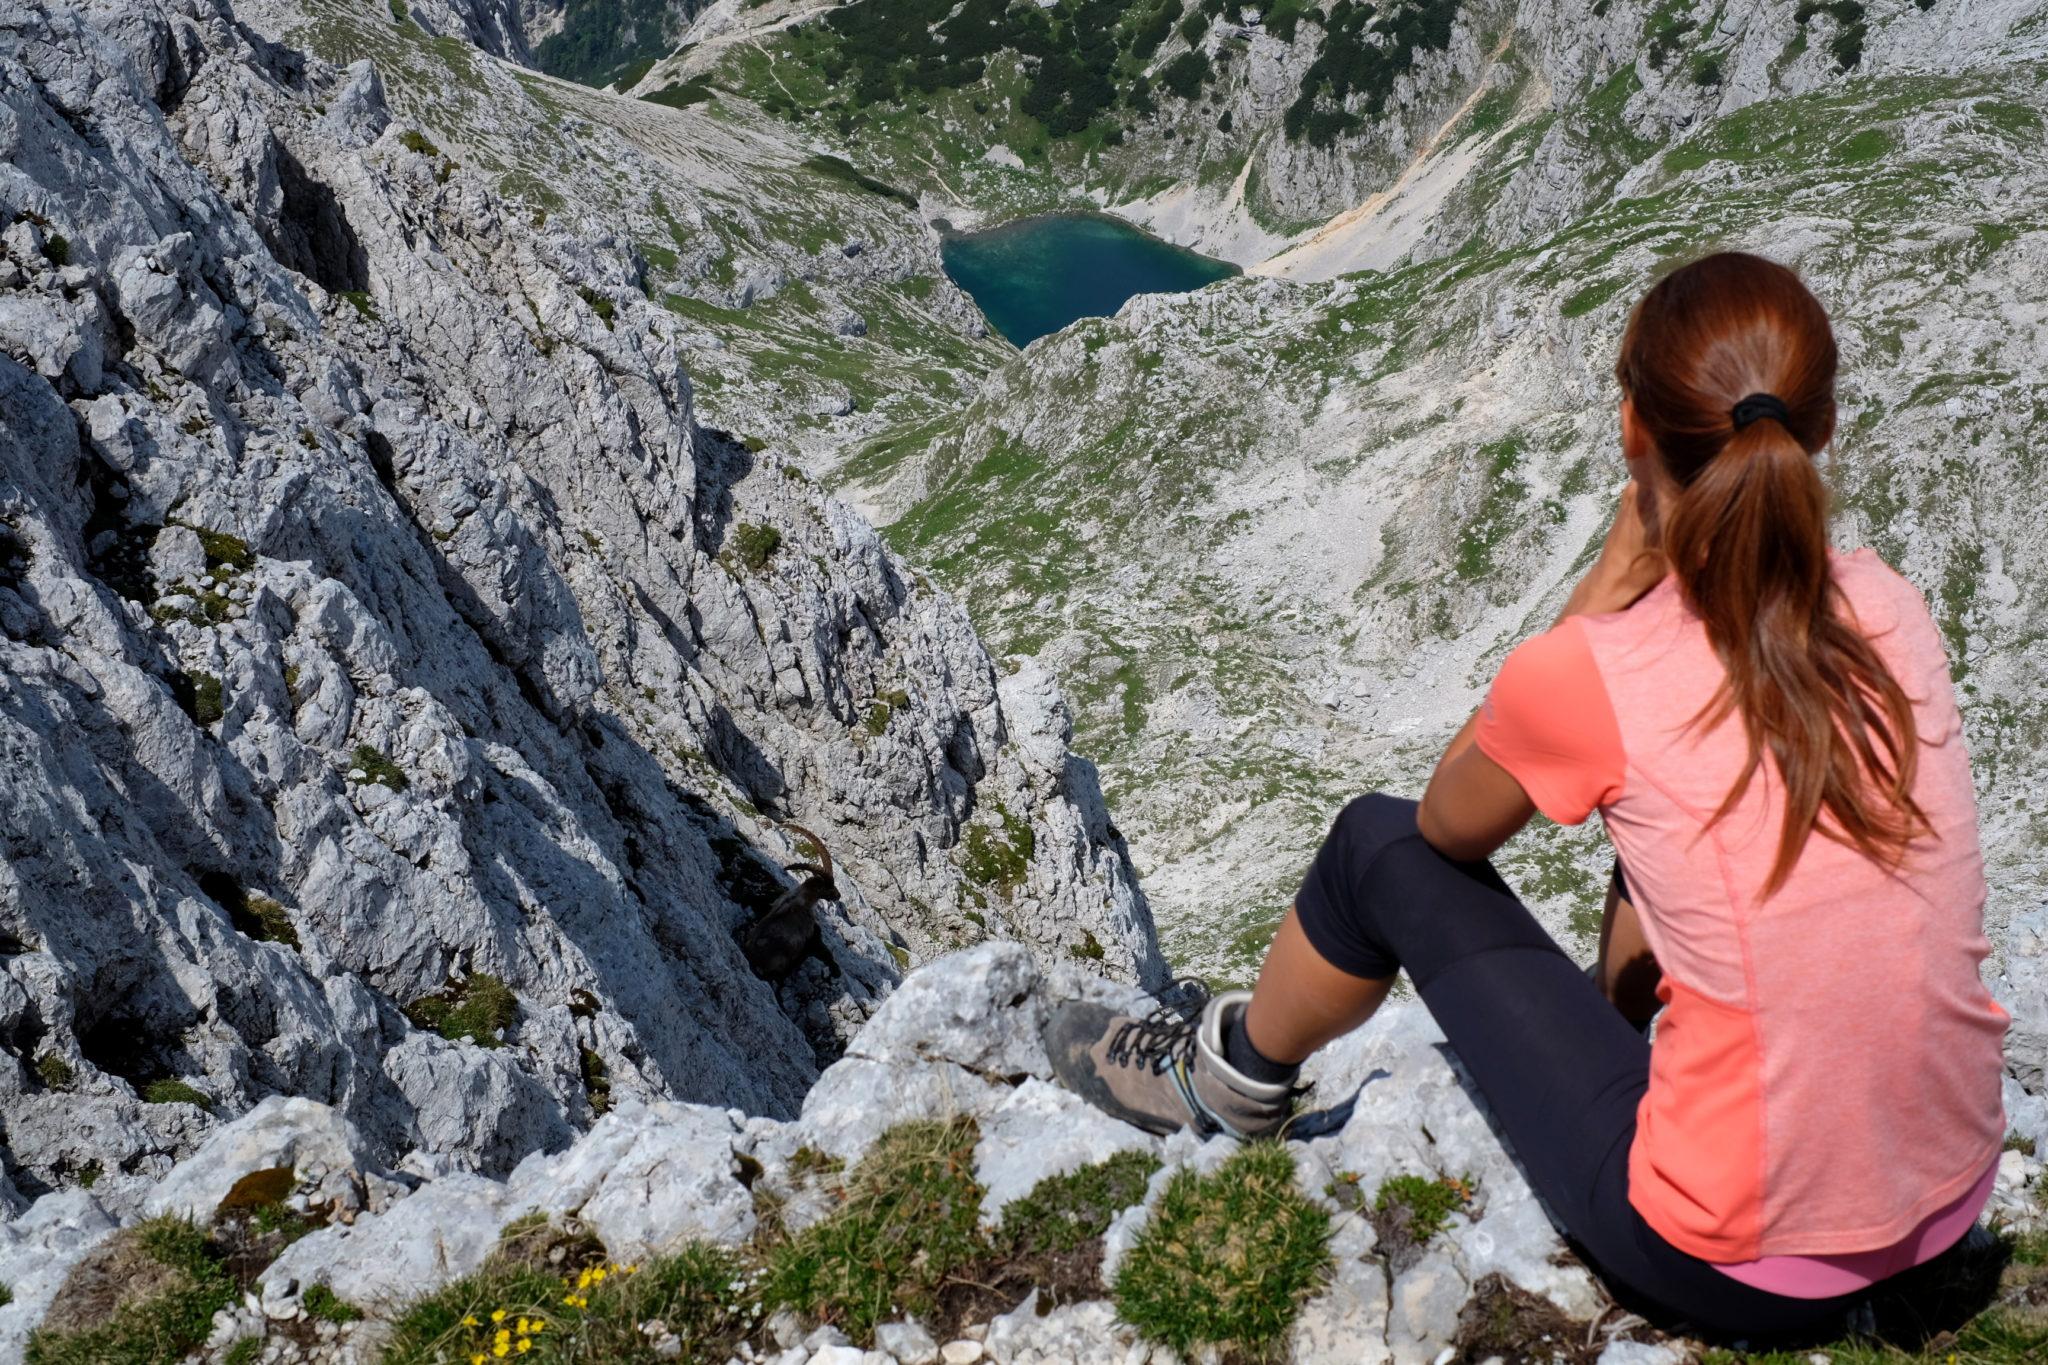 Hiking in Julian Alps, a lakes, an Alpine ibex, a woman hiker